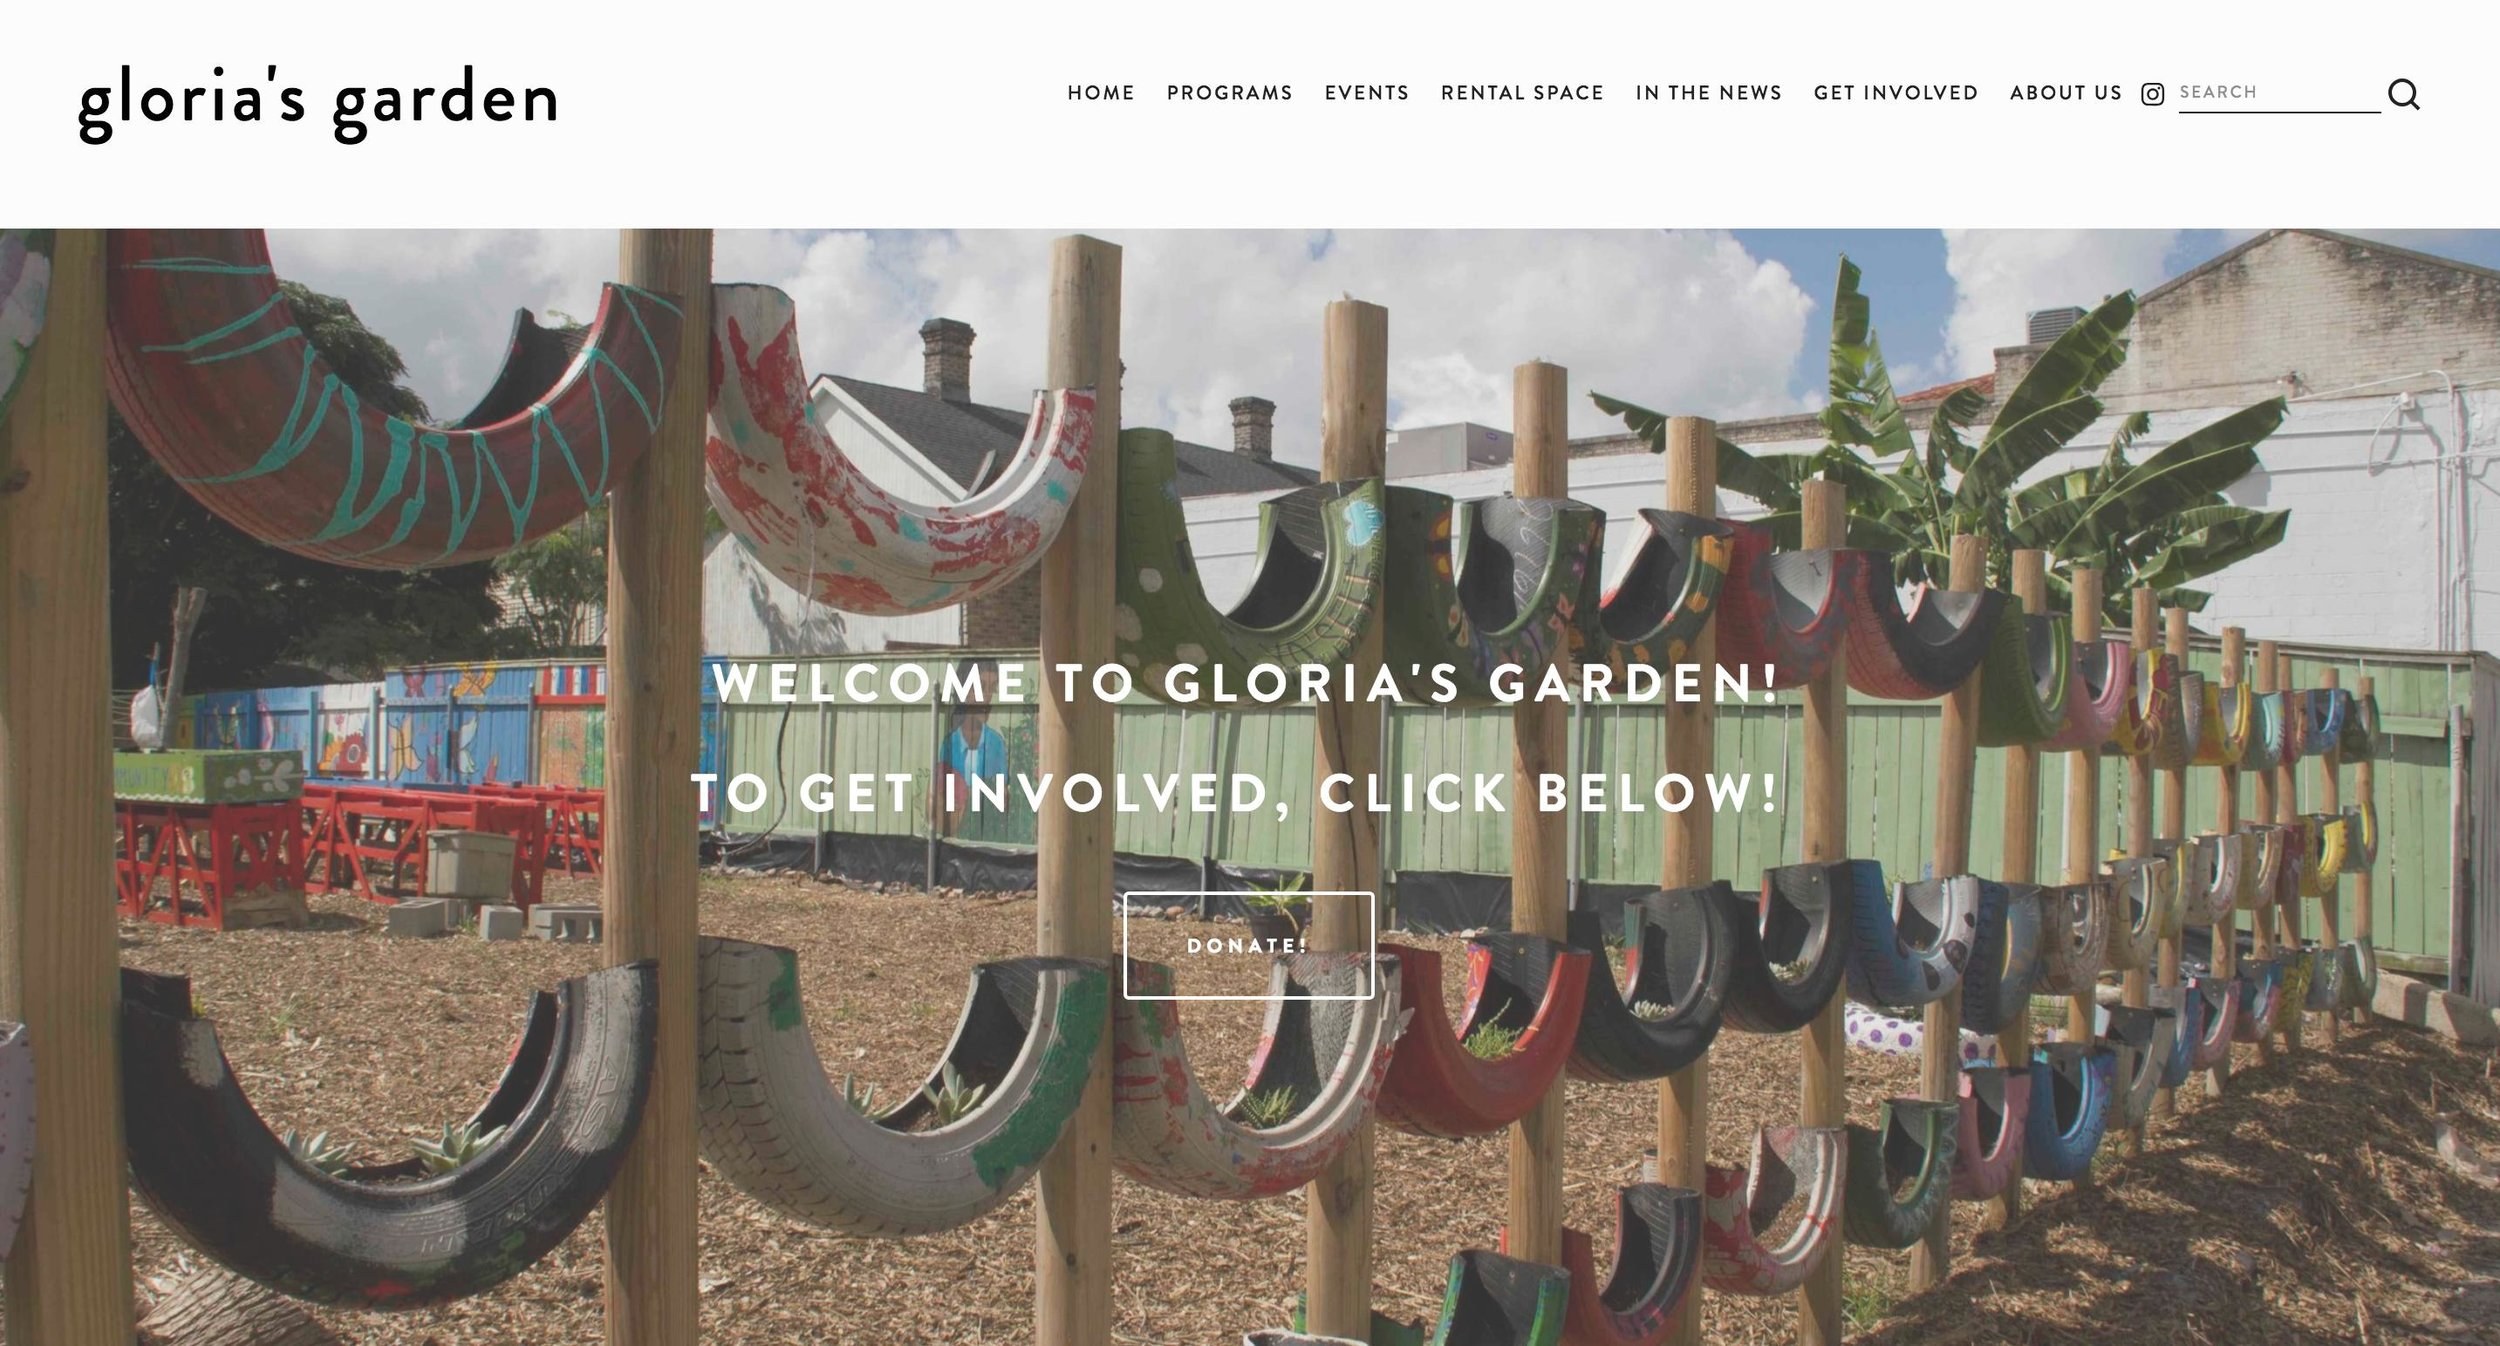 GloriasTremeGarden.com